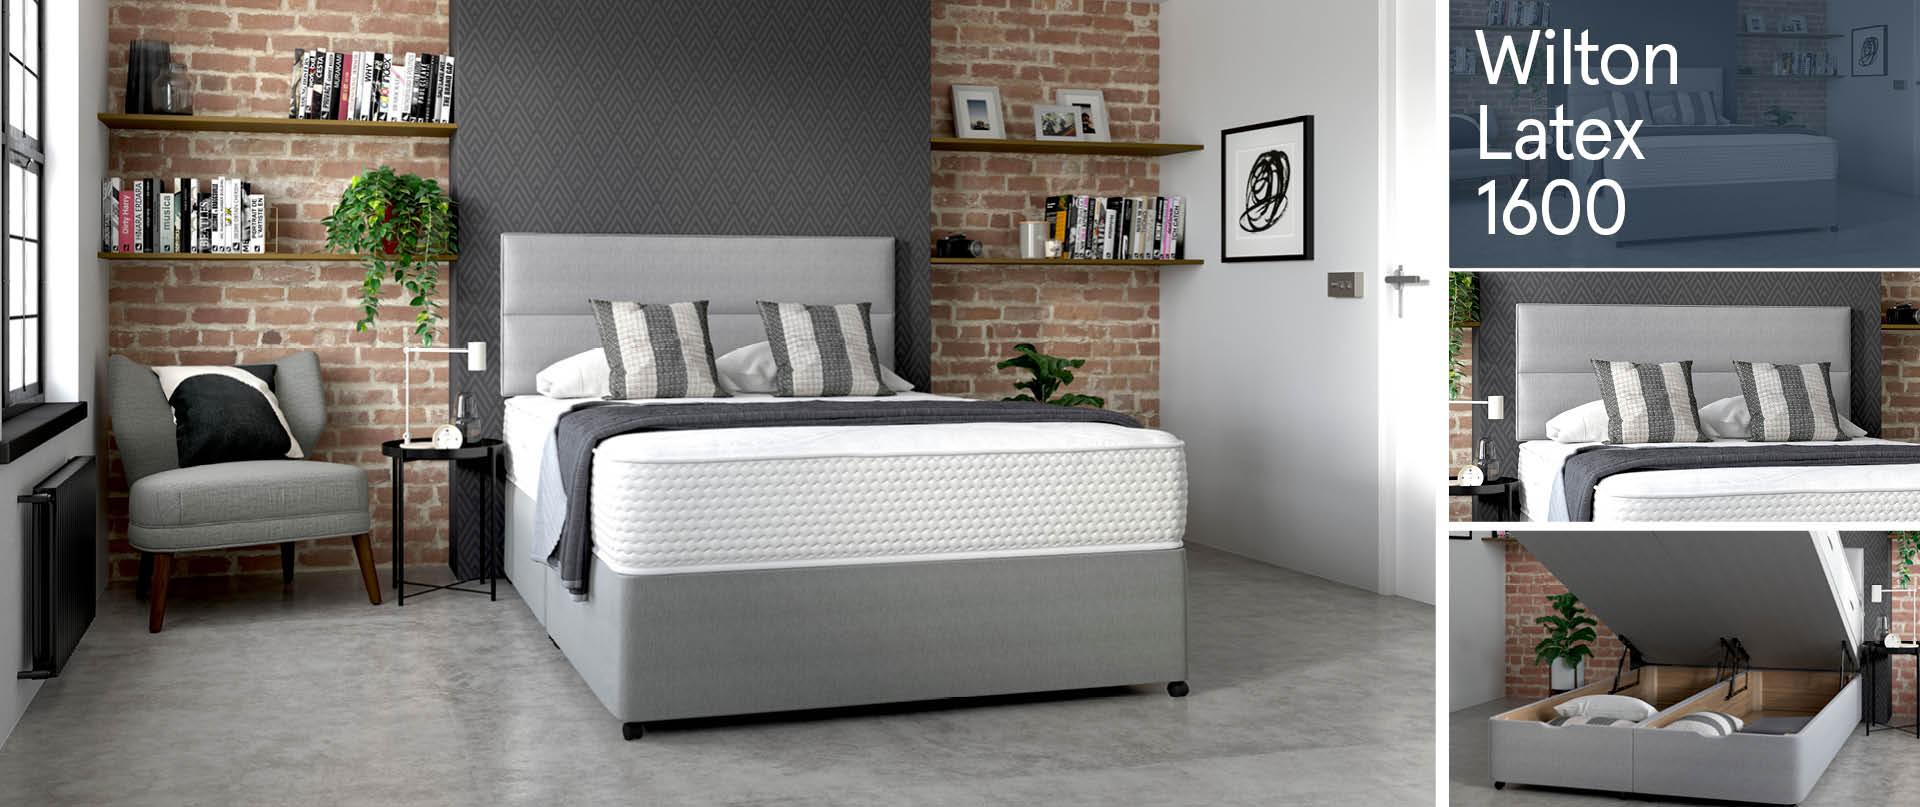 Wilton Latex 1600 Ottoman Beds Ranges